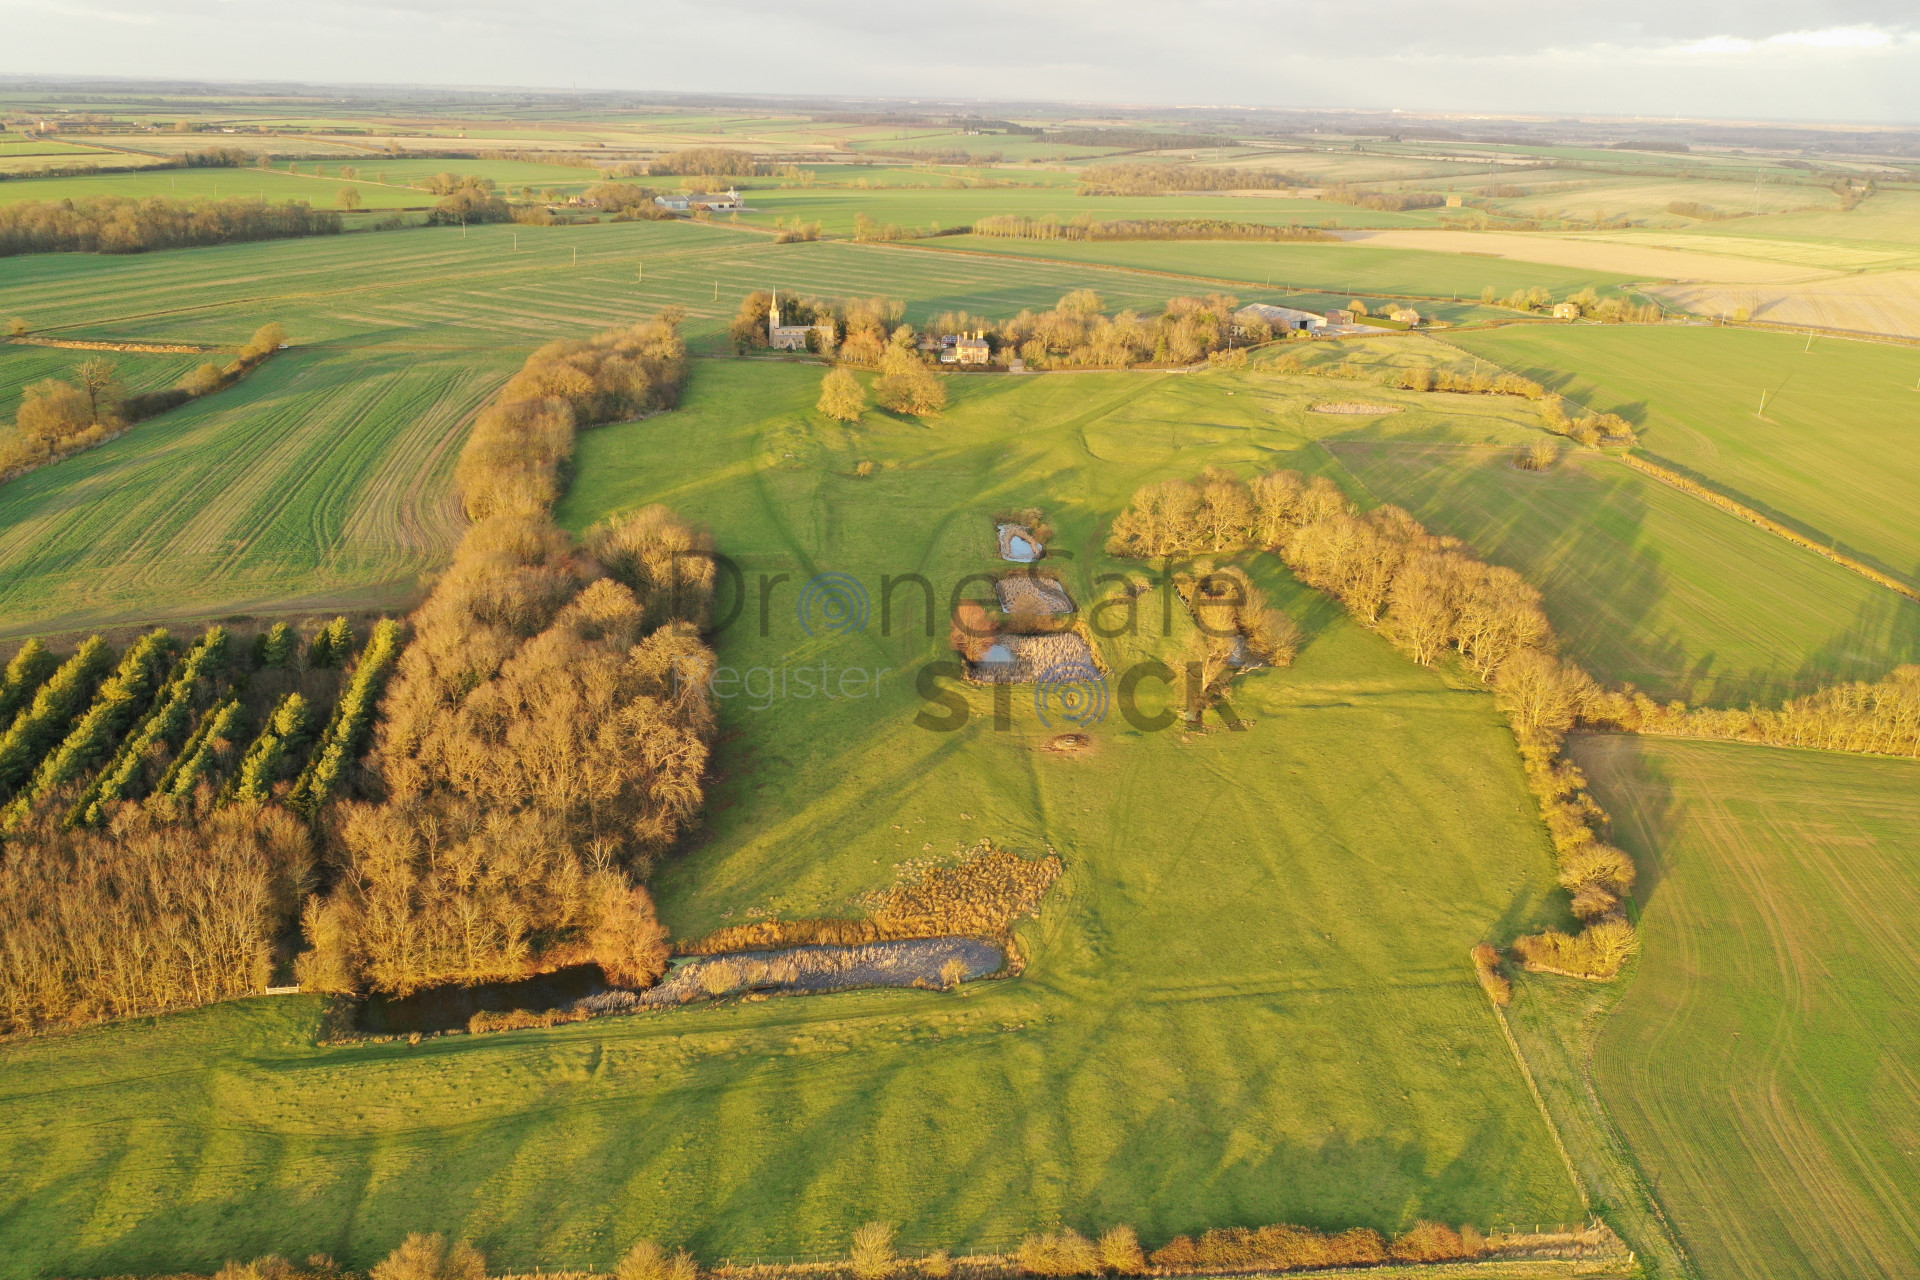 eVo-Air Drone Aerial Photography